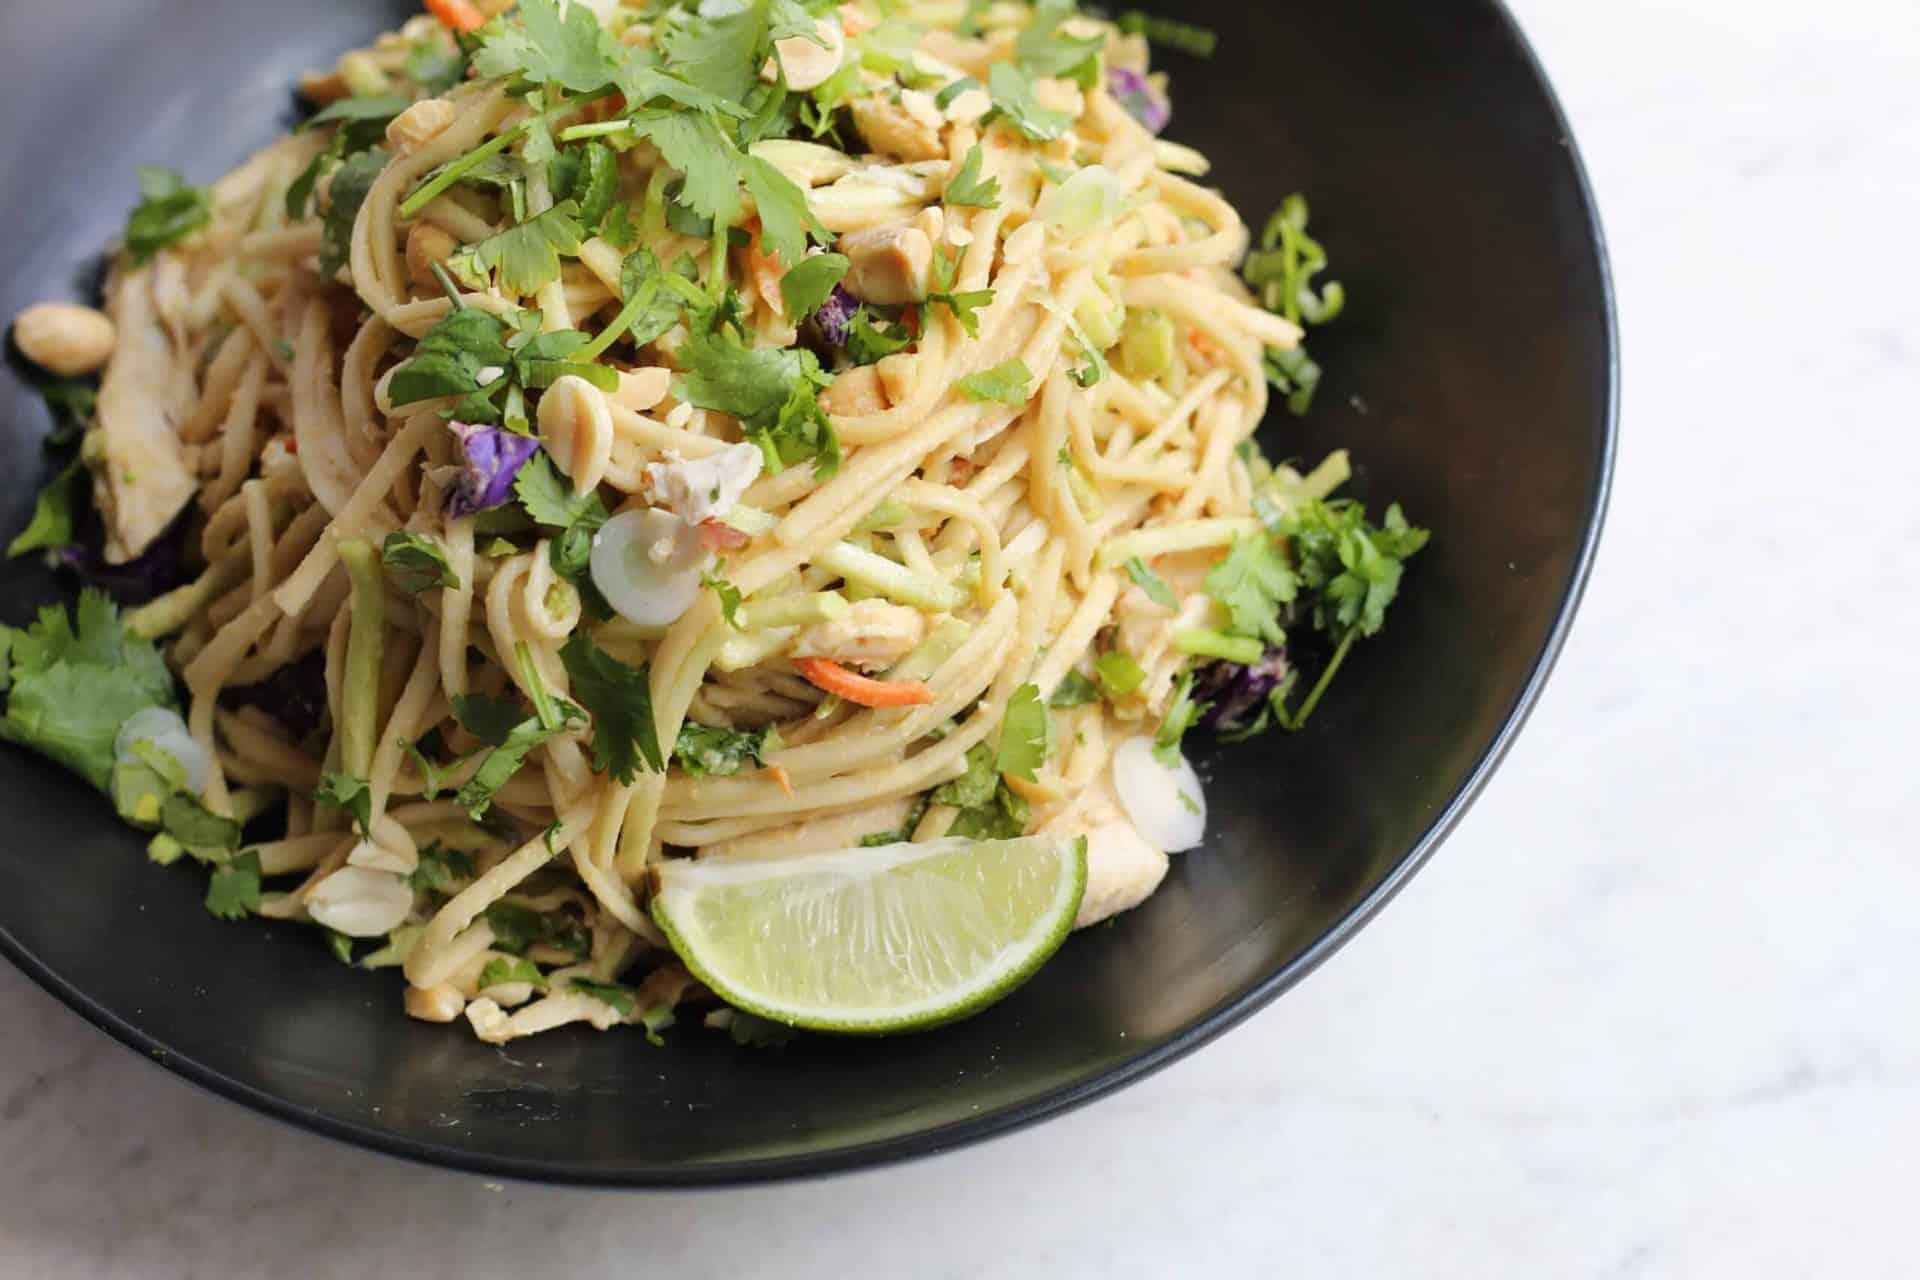 Cold Chicken Udon Noodle Salad